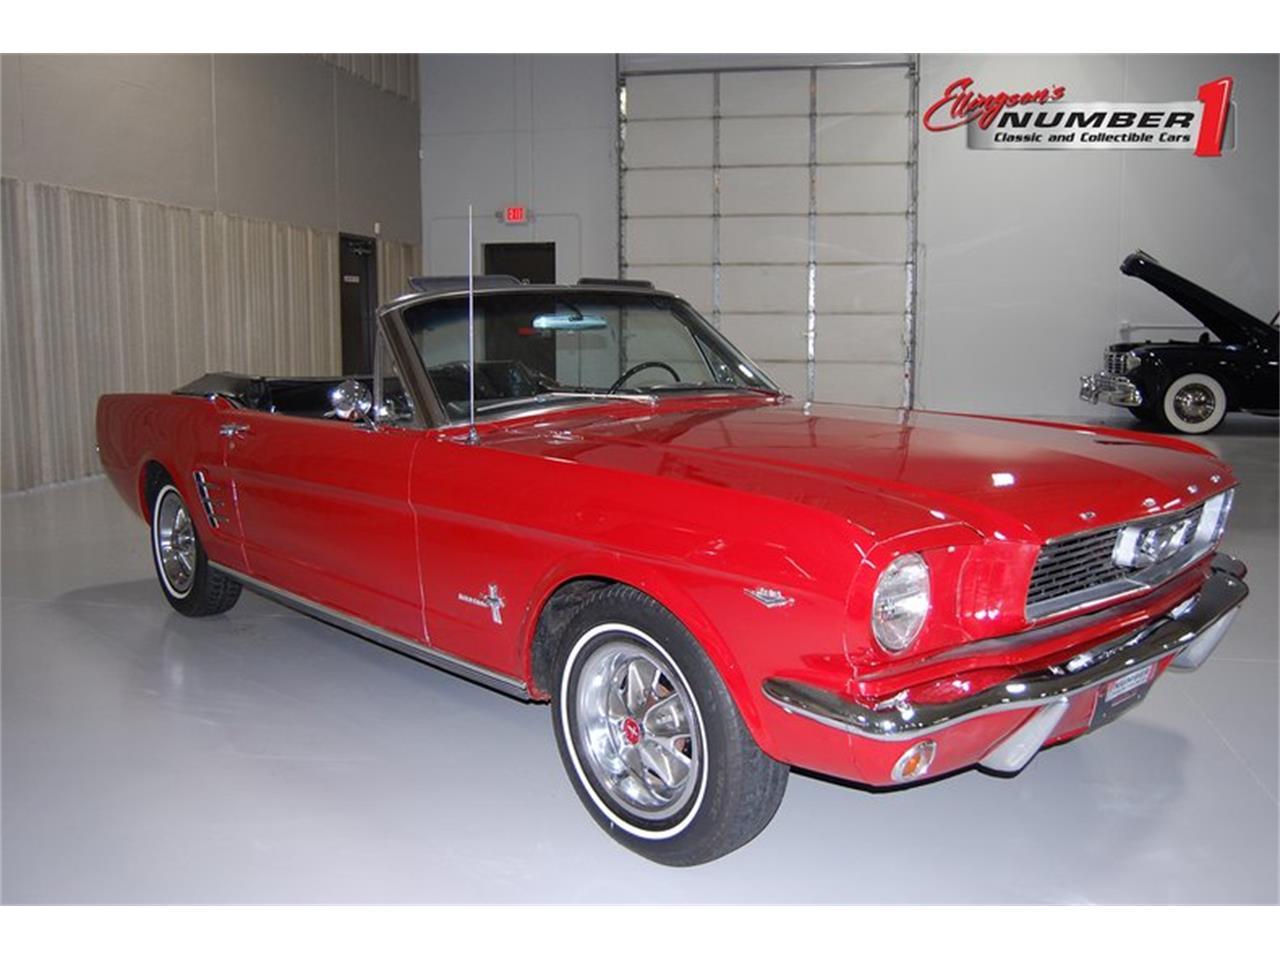 Ford Mustang Prix tout compris 1966